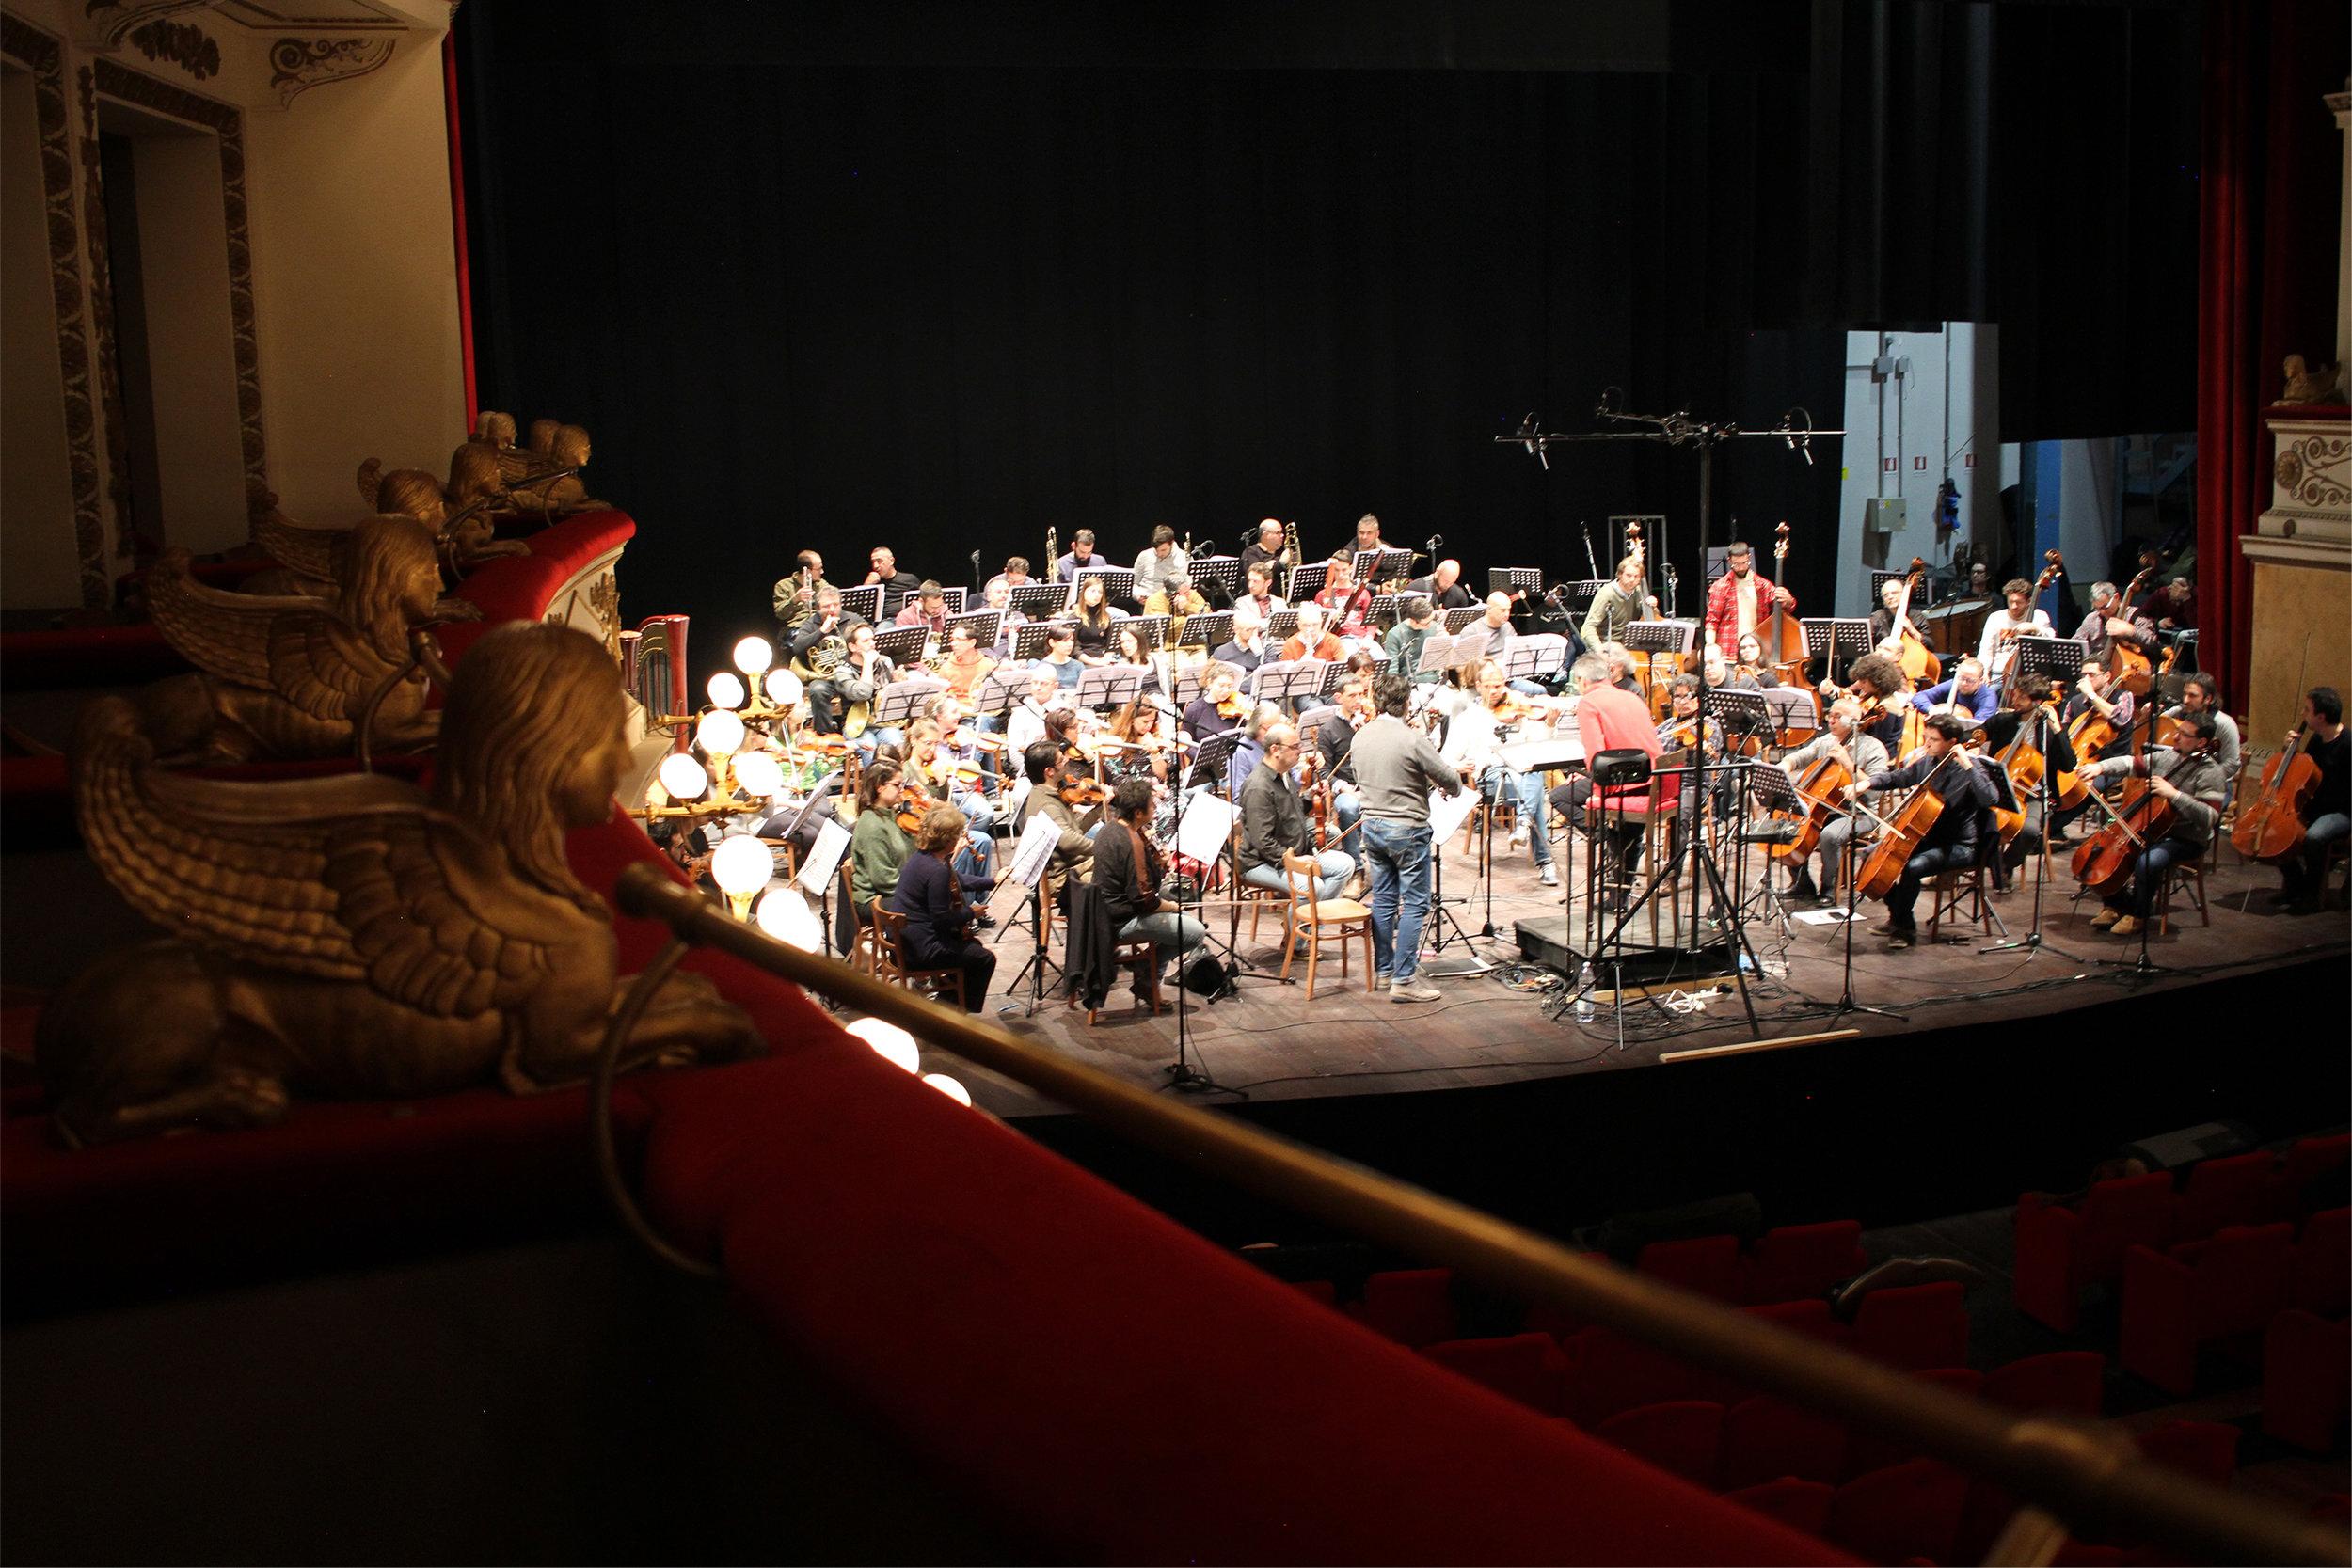 Bohemisphere_Orchestra.jpg